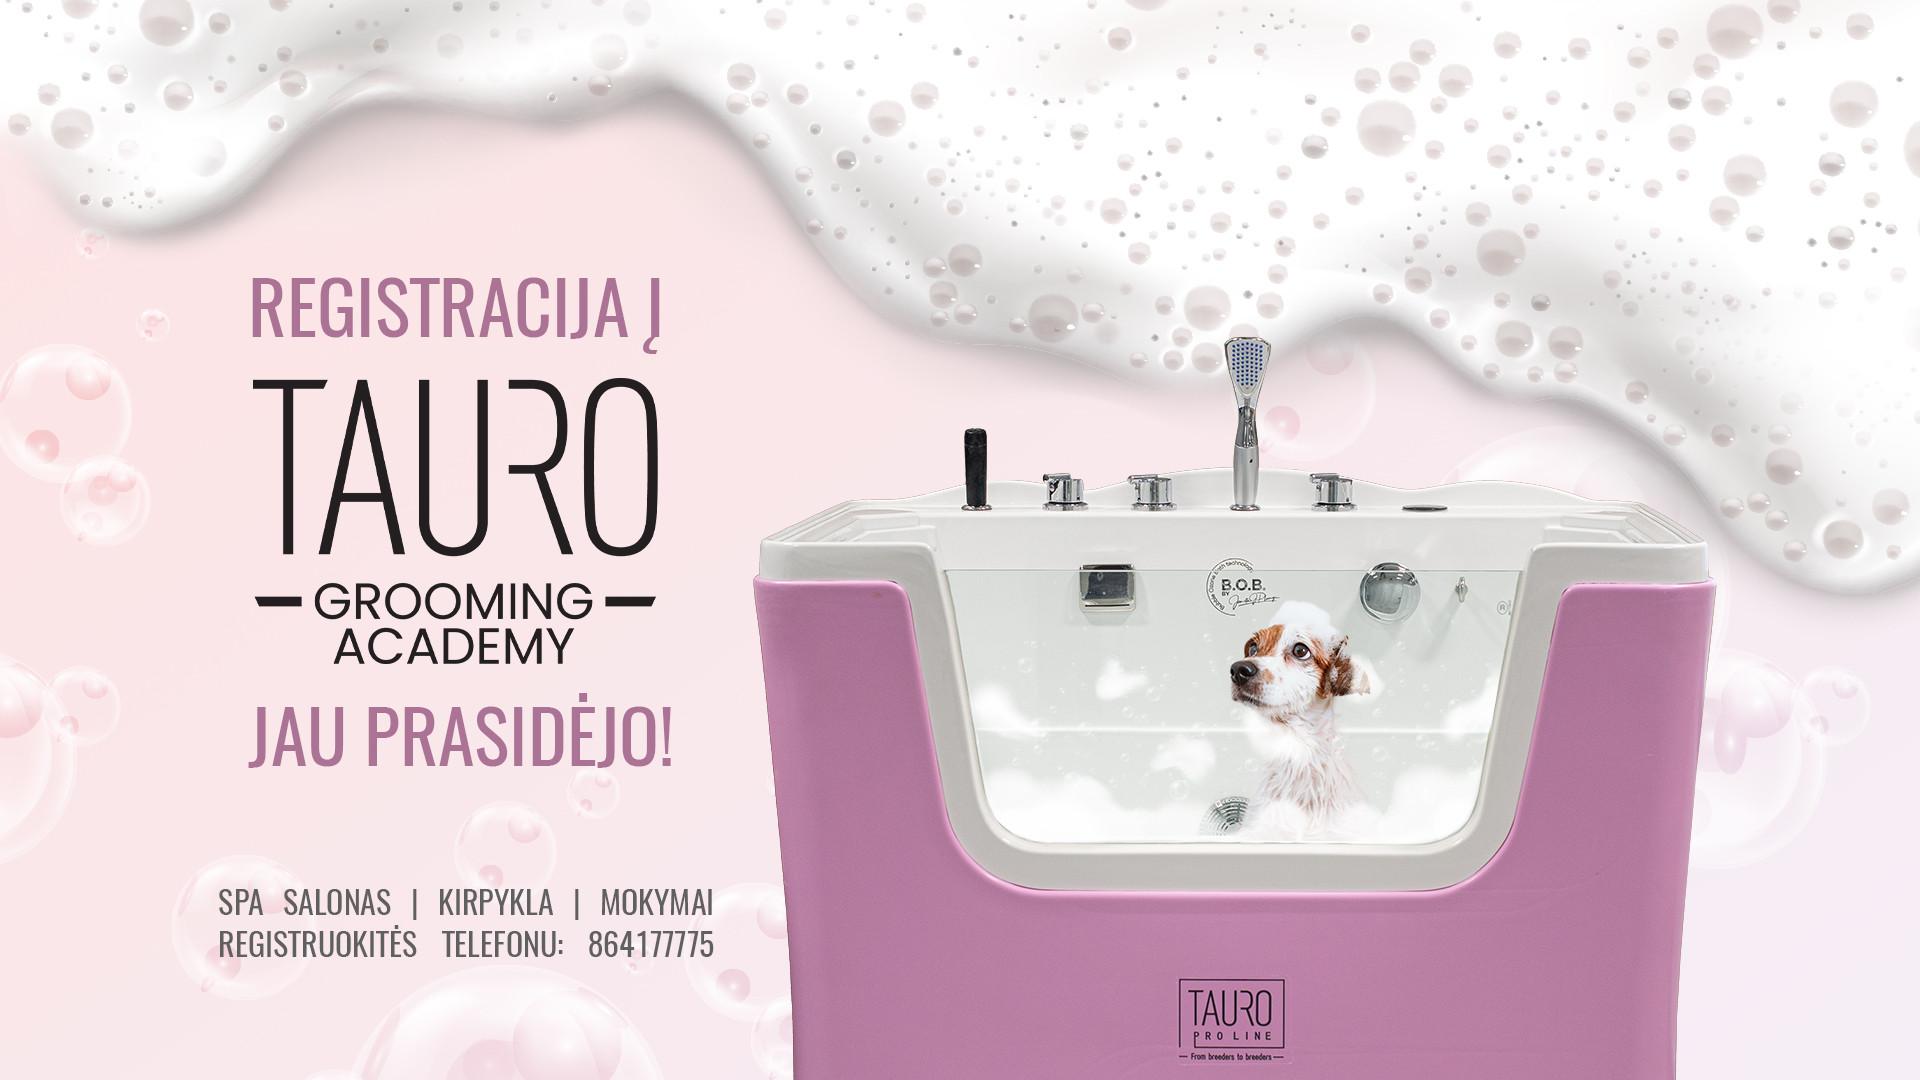 Tauro Grooming Academy